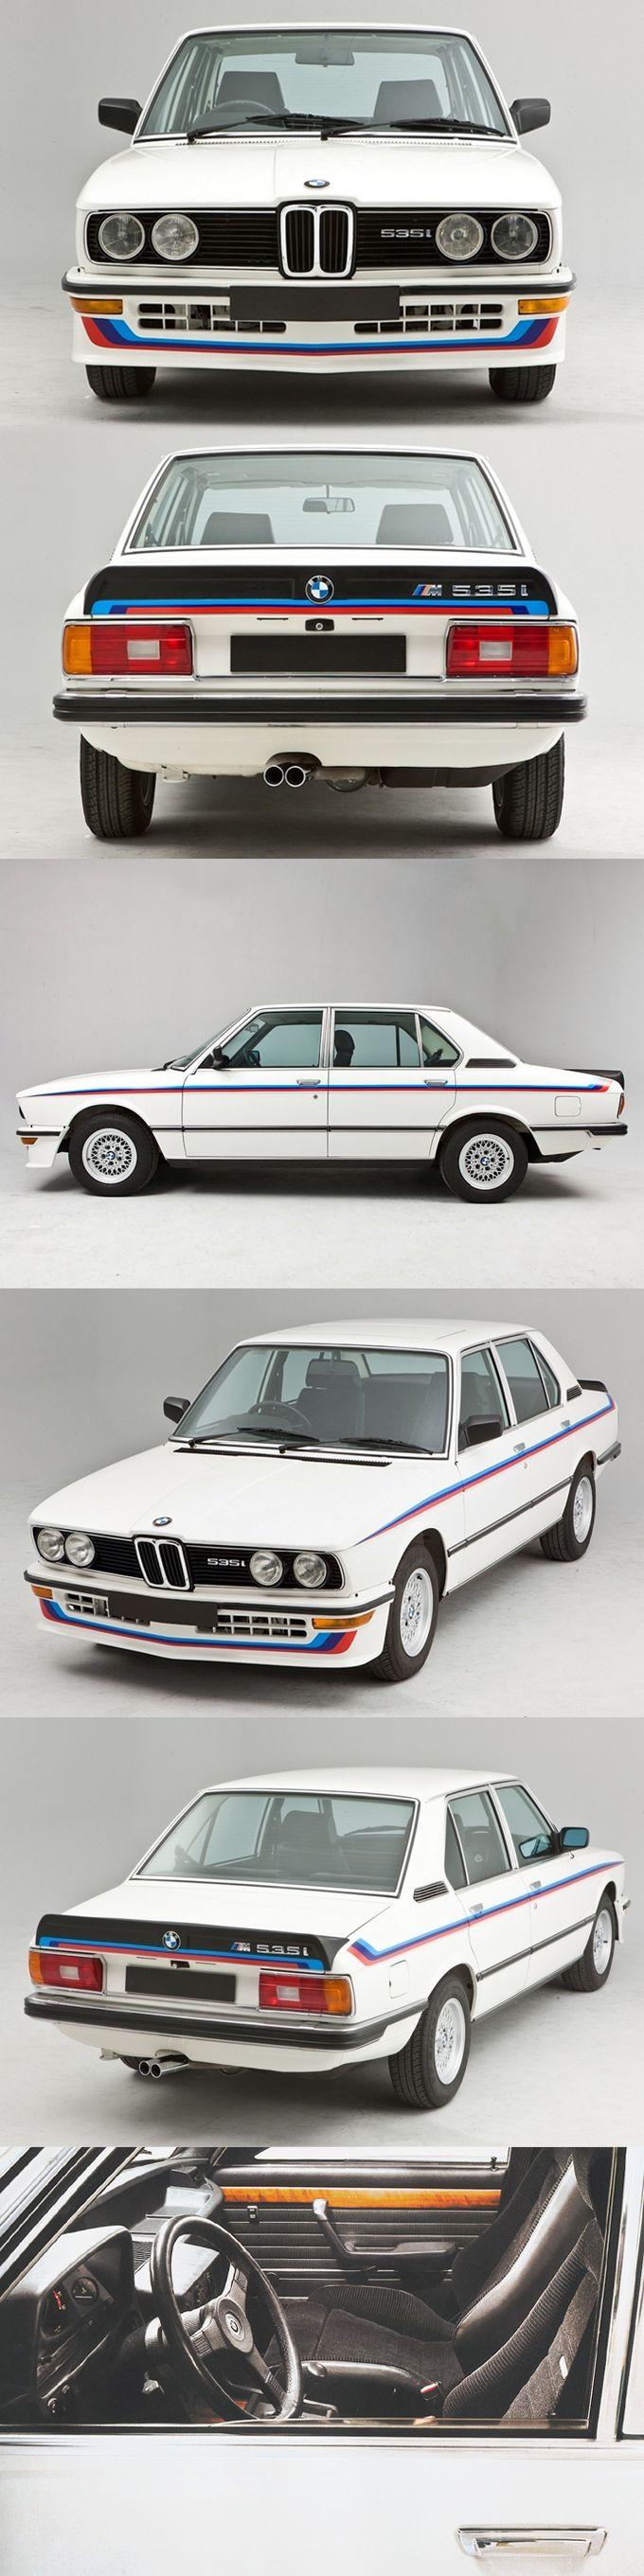 1980 BMW M535i / Motorsport / white blue red / Germany